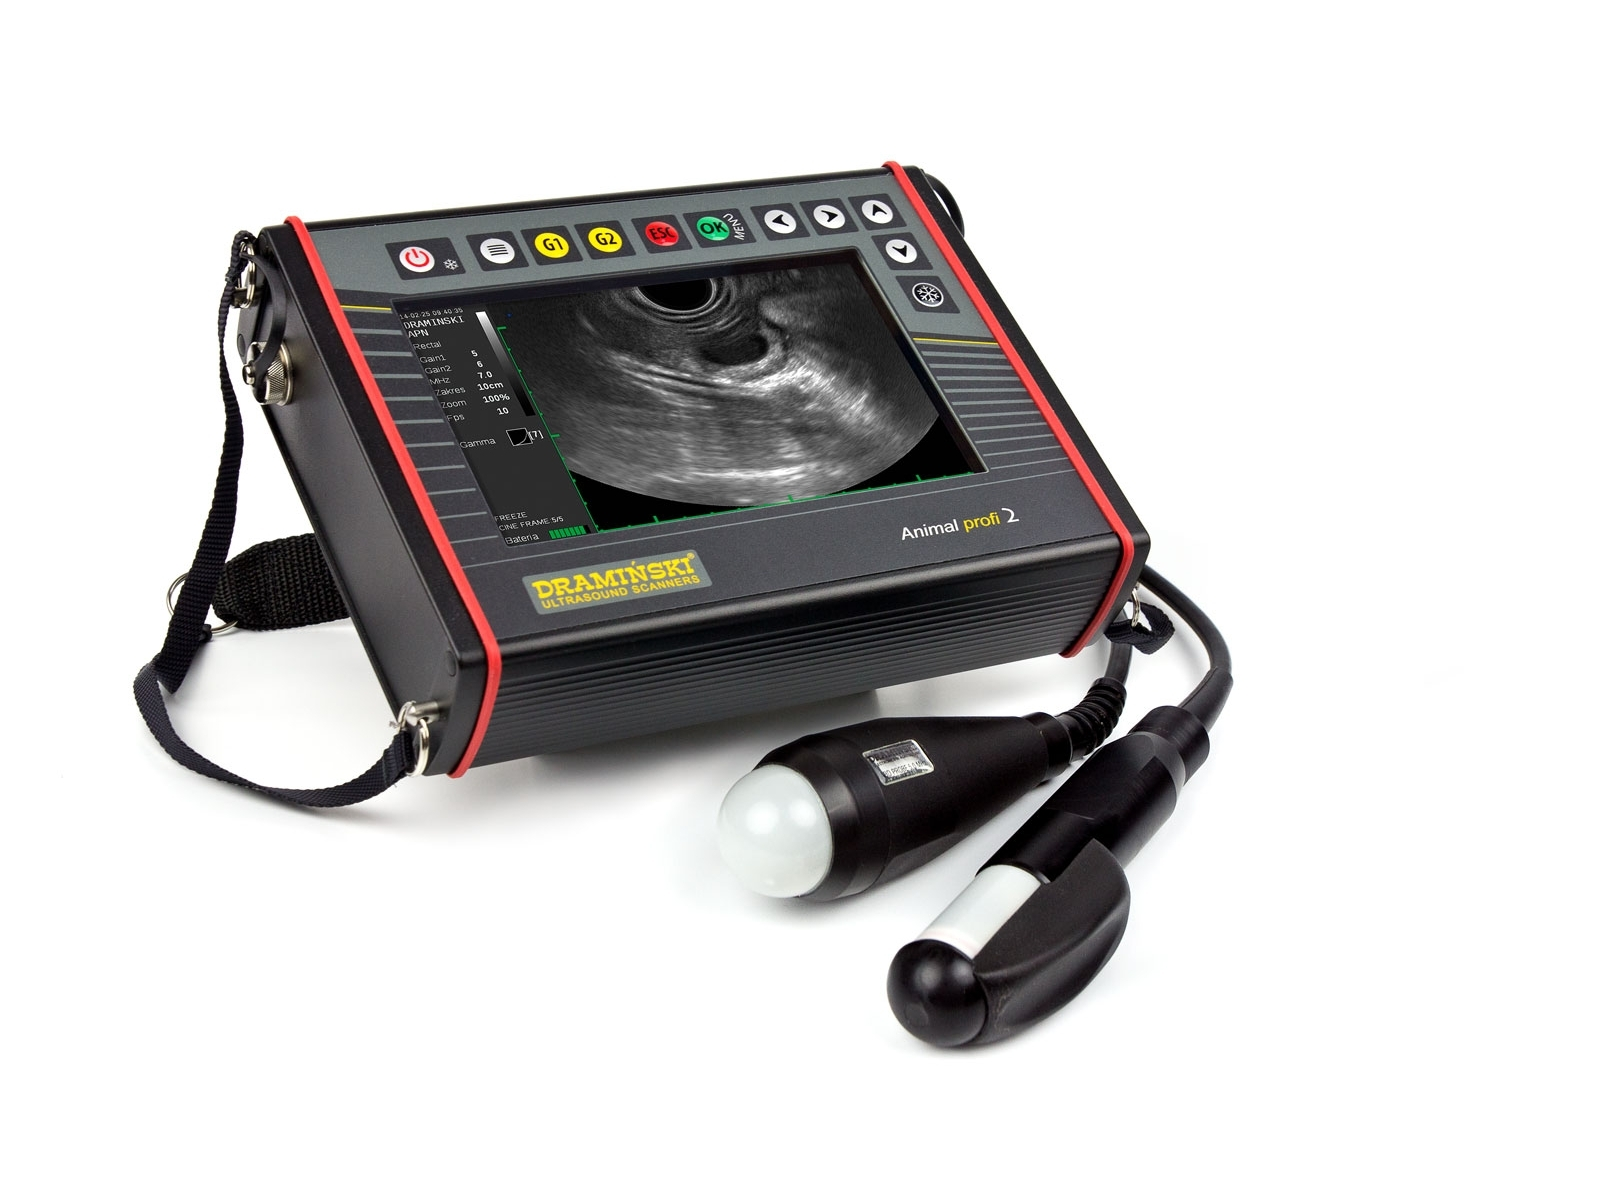 Veterinarinis ultragarso skeneris Animal profi 2